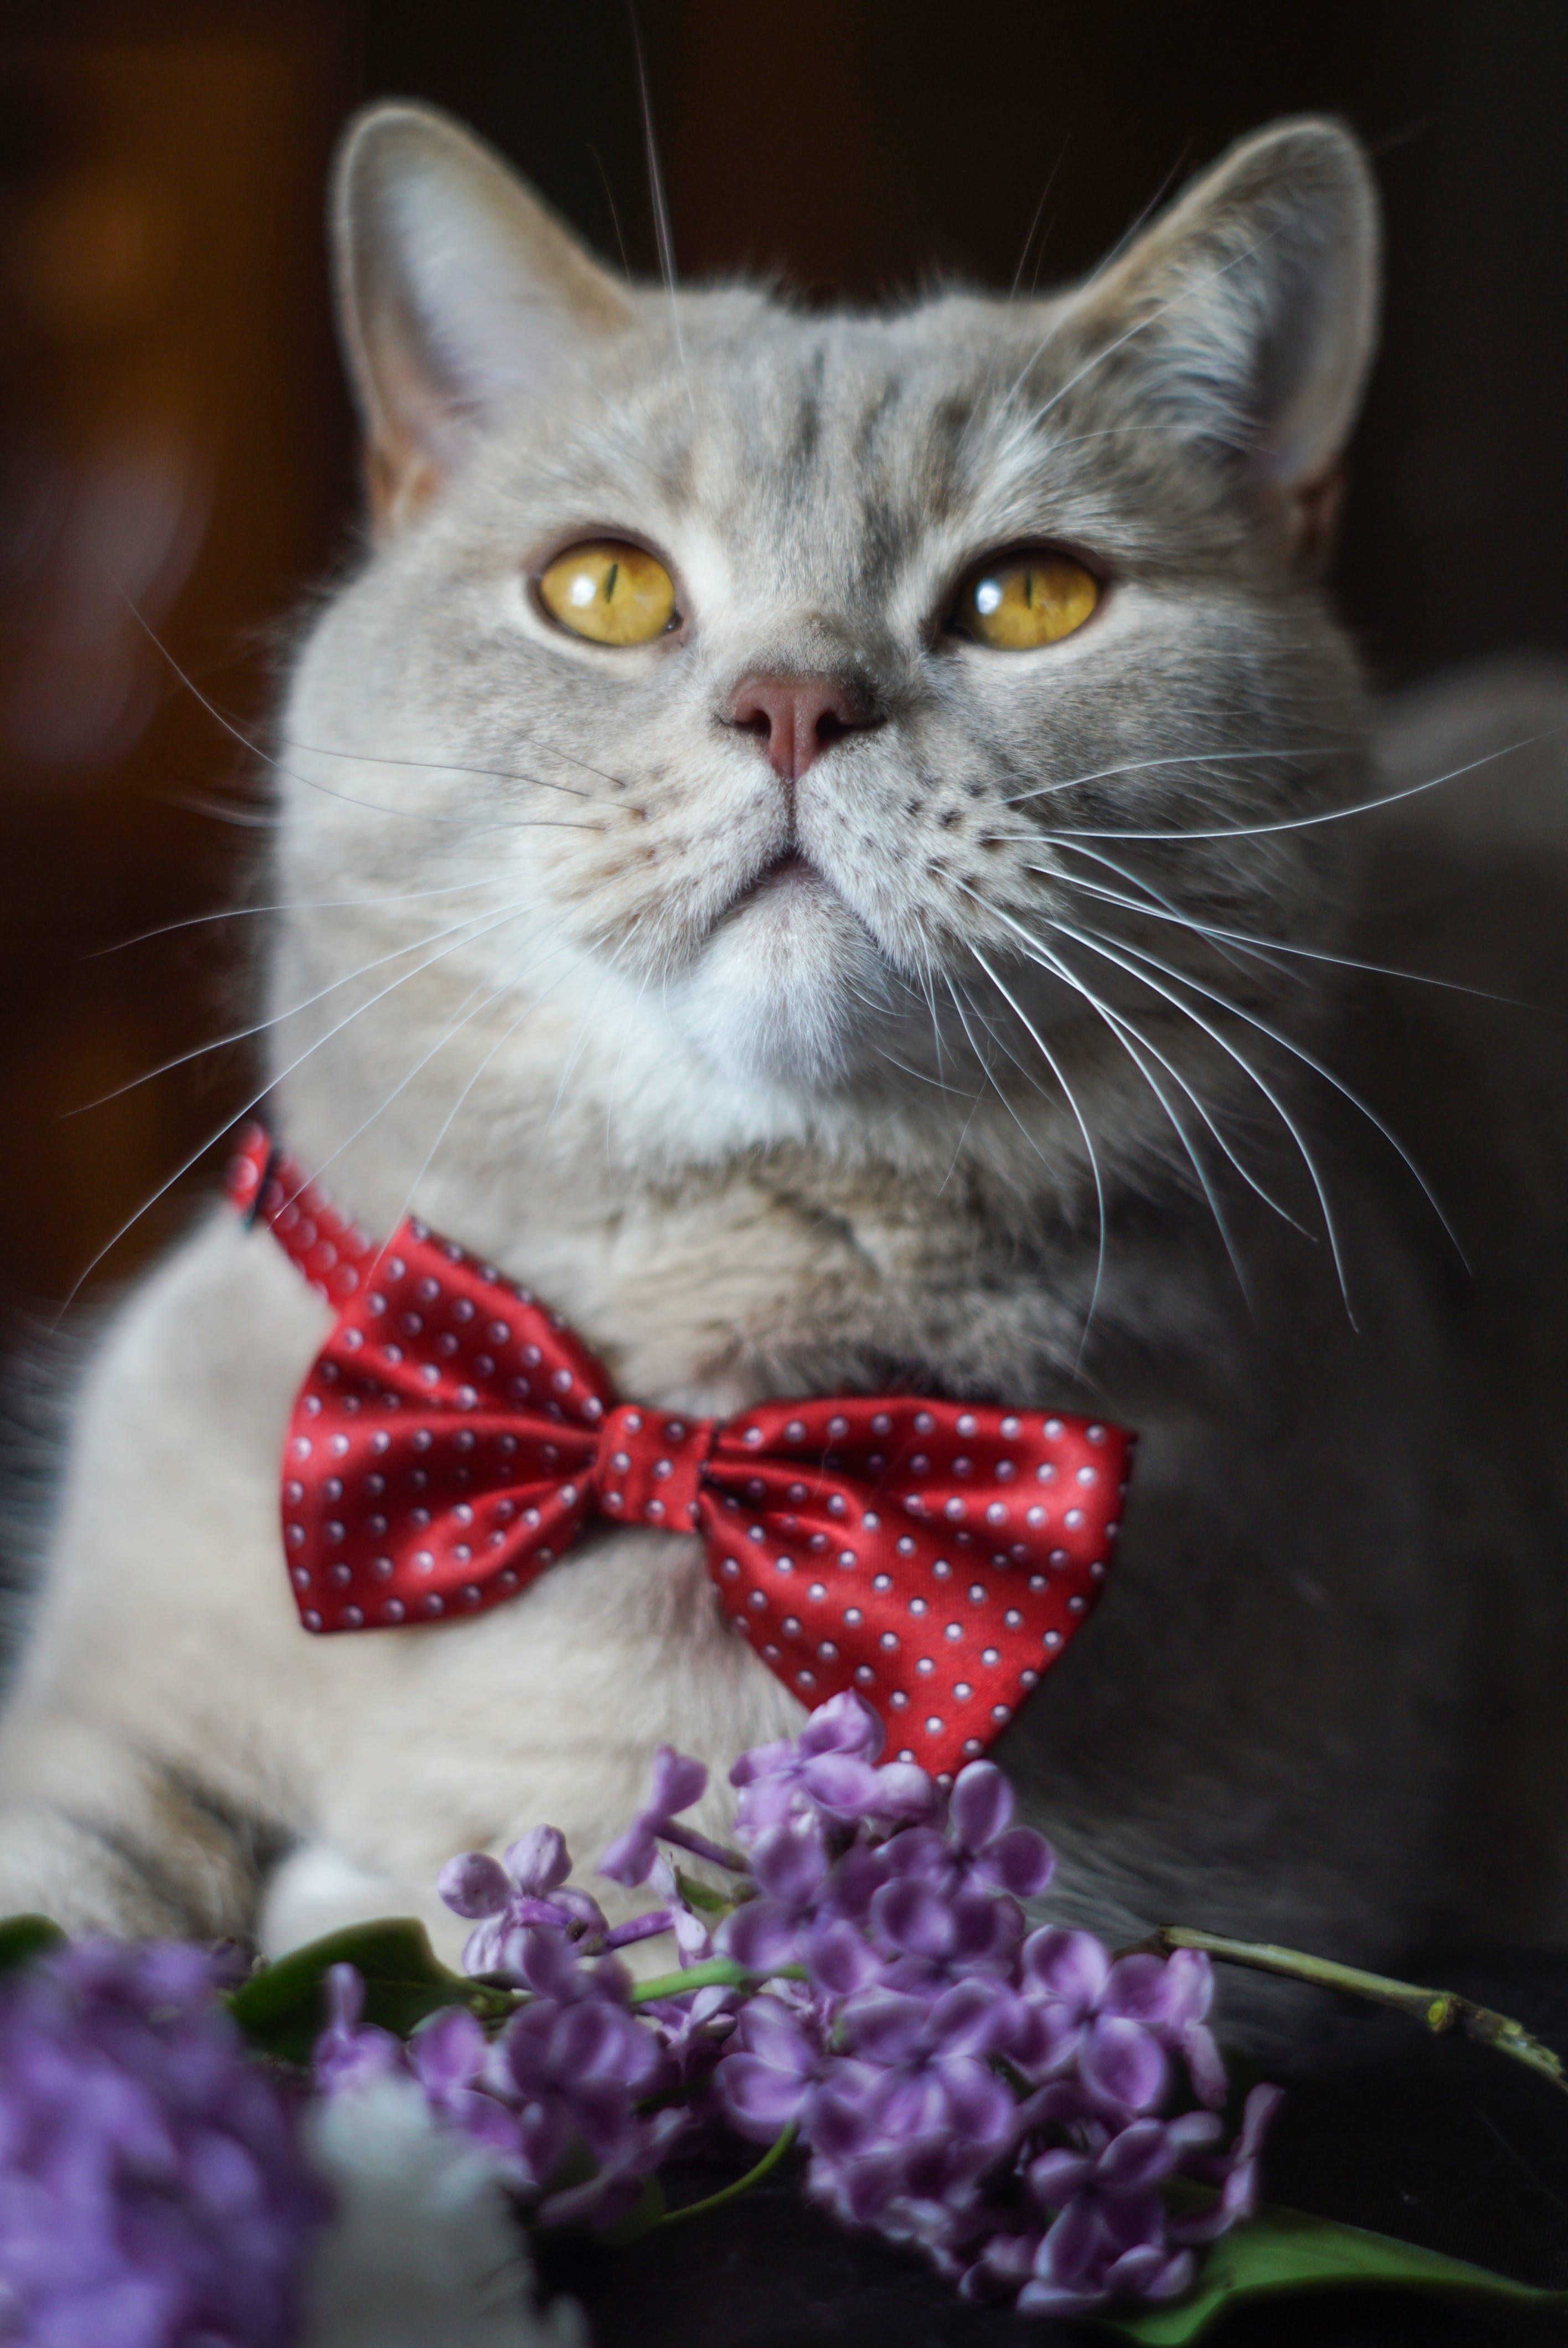 Kostenloses Stock Foto zu blauen blüten, bogen, britisch kurzhaar, elegant